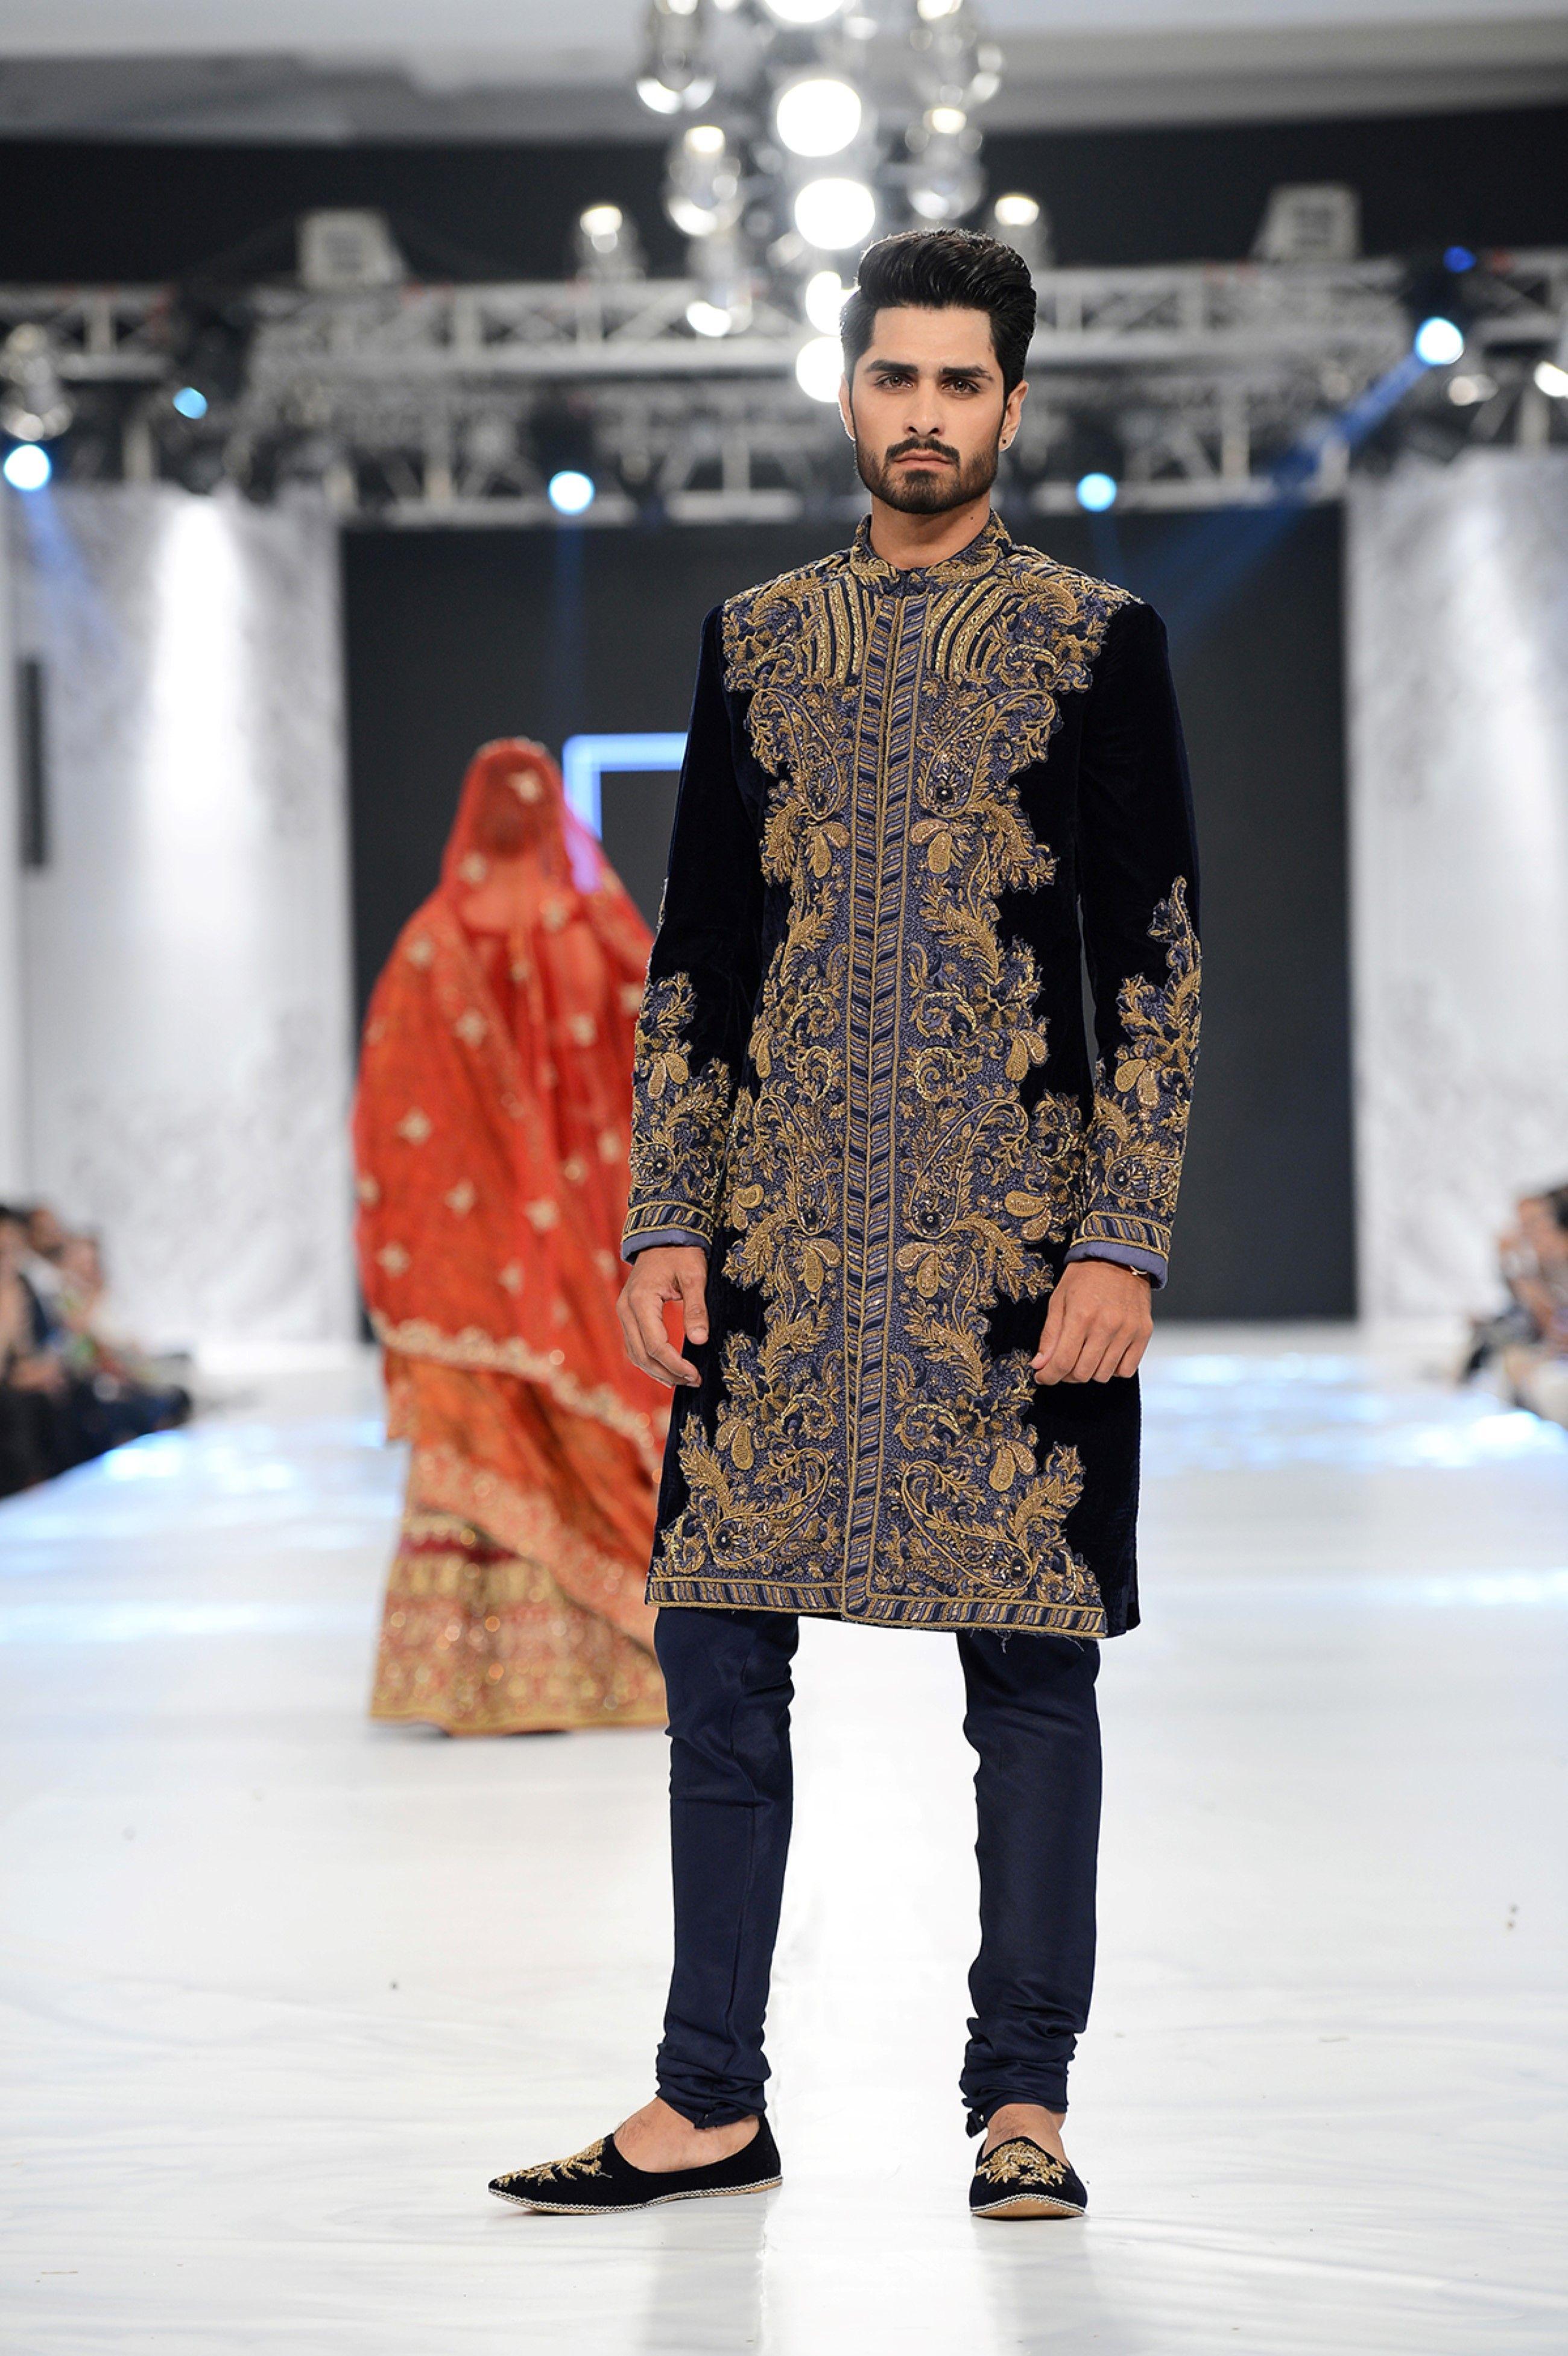 Sheristan The Kingdom Pinterest Wedding dress men